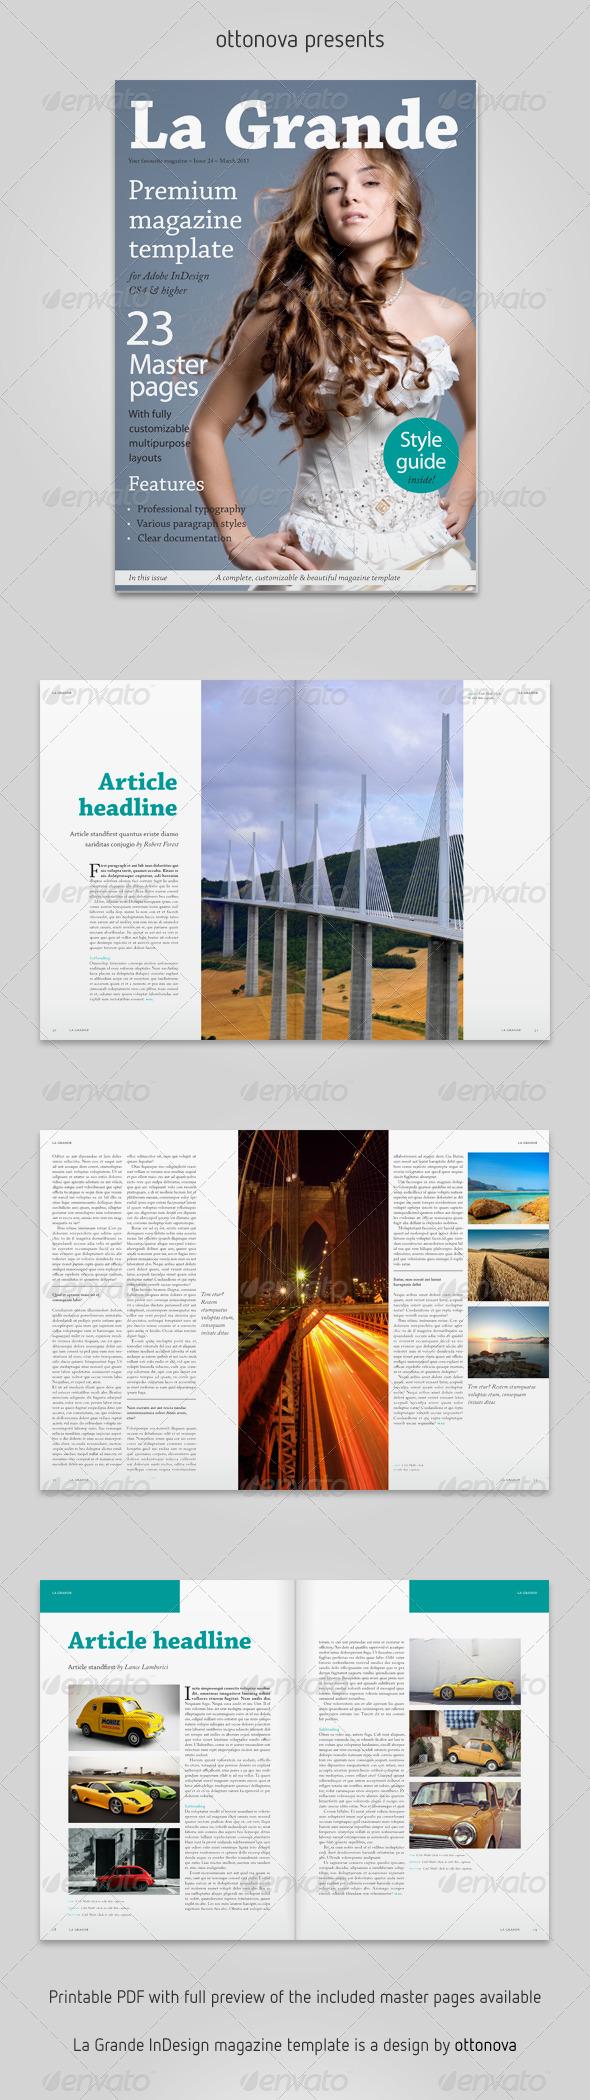 La Grande InDesign magazine template - Magazines Print Templates